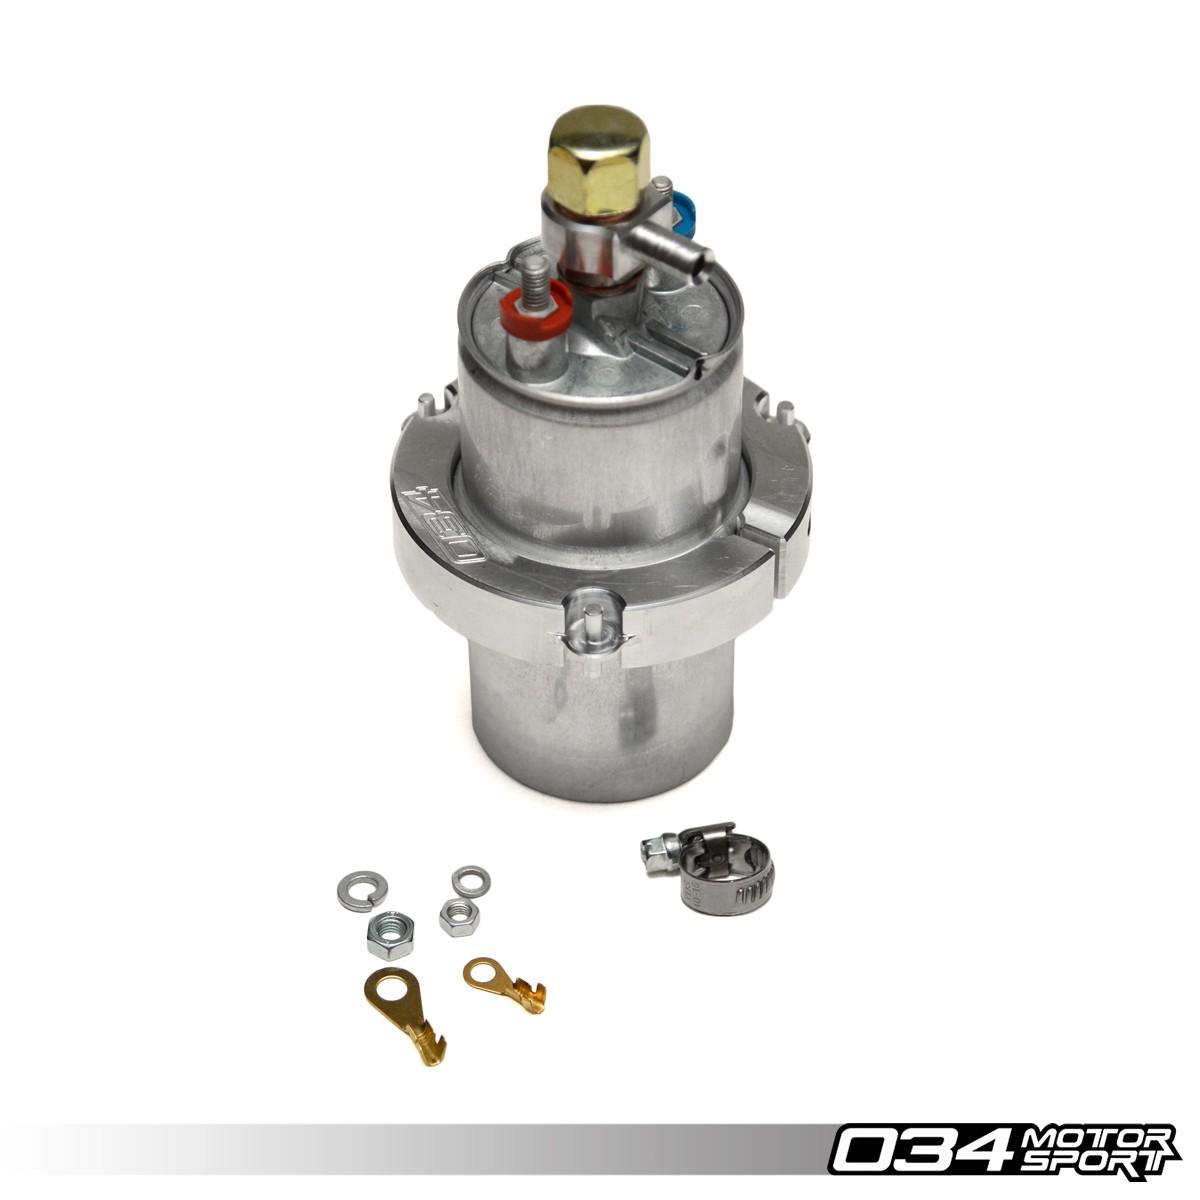 hight resolution of billet drop in fuel pump upgrade kit bosch high output 040